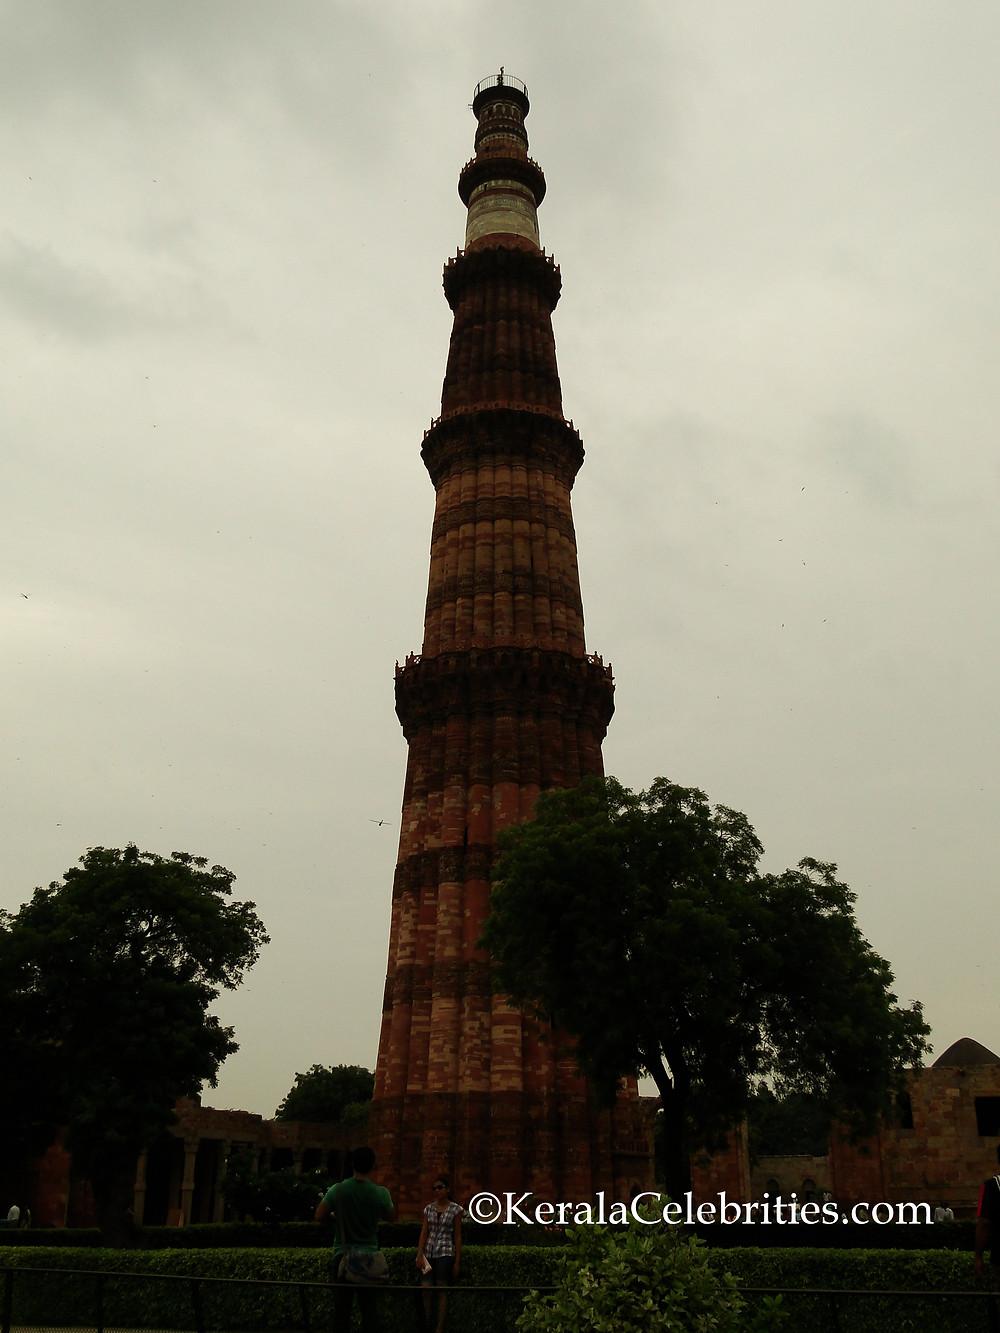 Qutb Minar full view - KeralaCelebrities.com